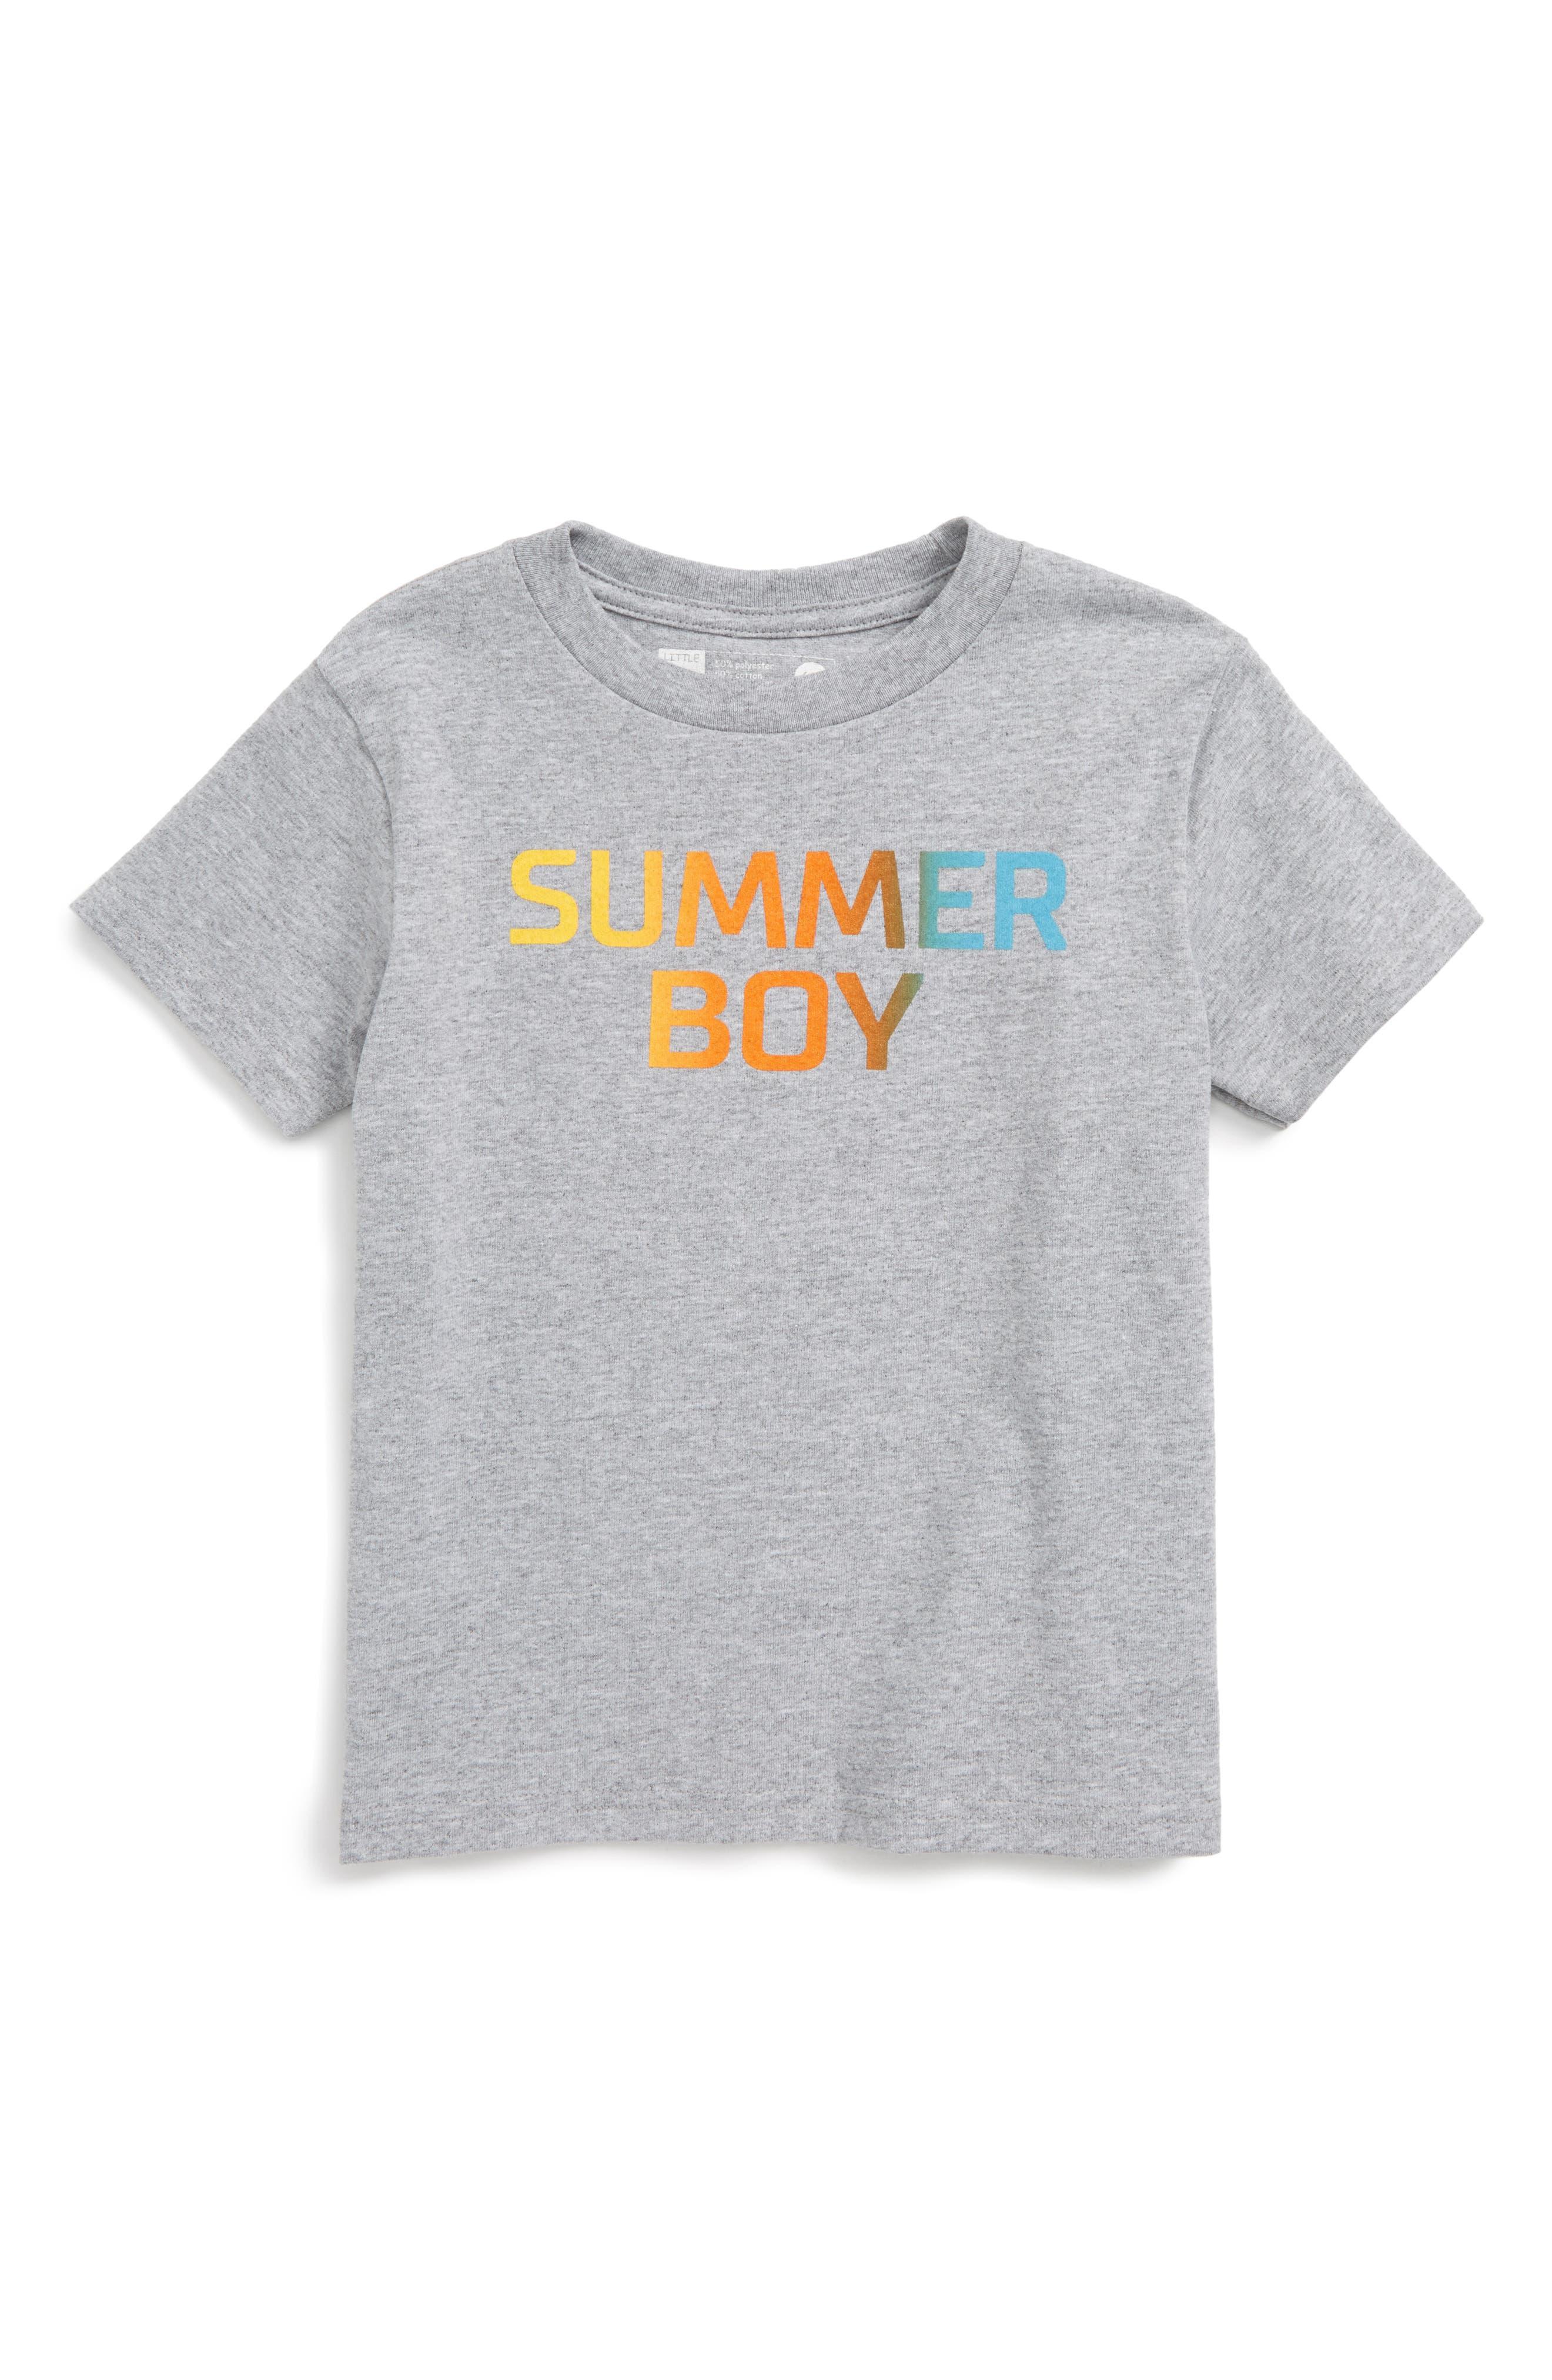 Summer Boy Graphic T-Shirt,                         Main,                         color, 020